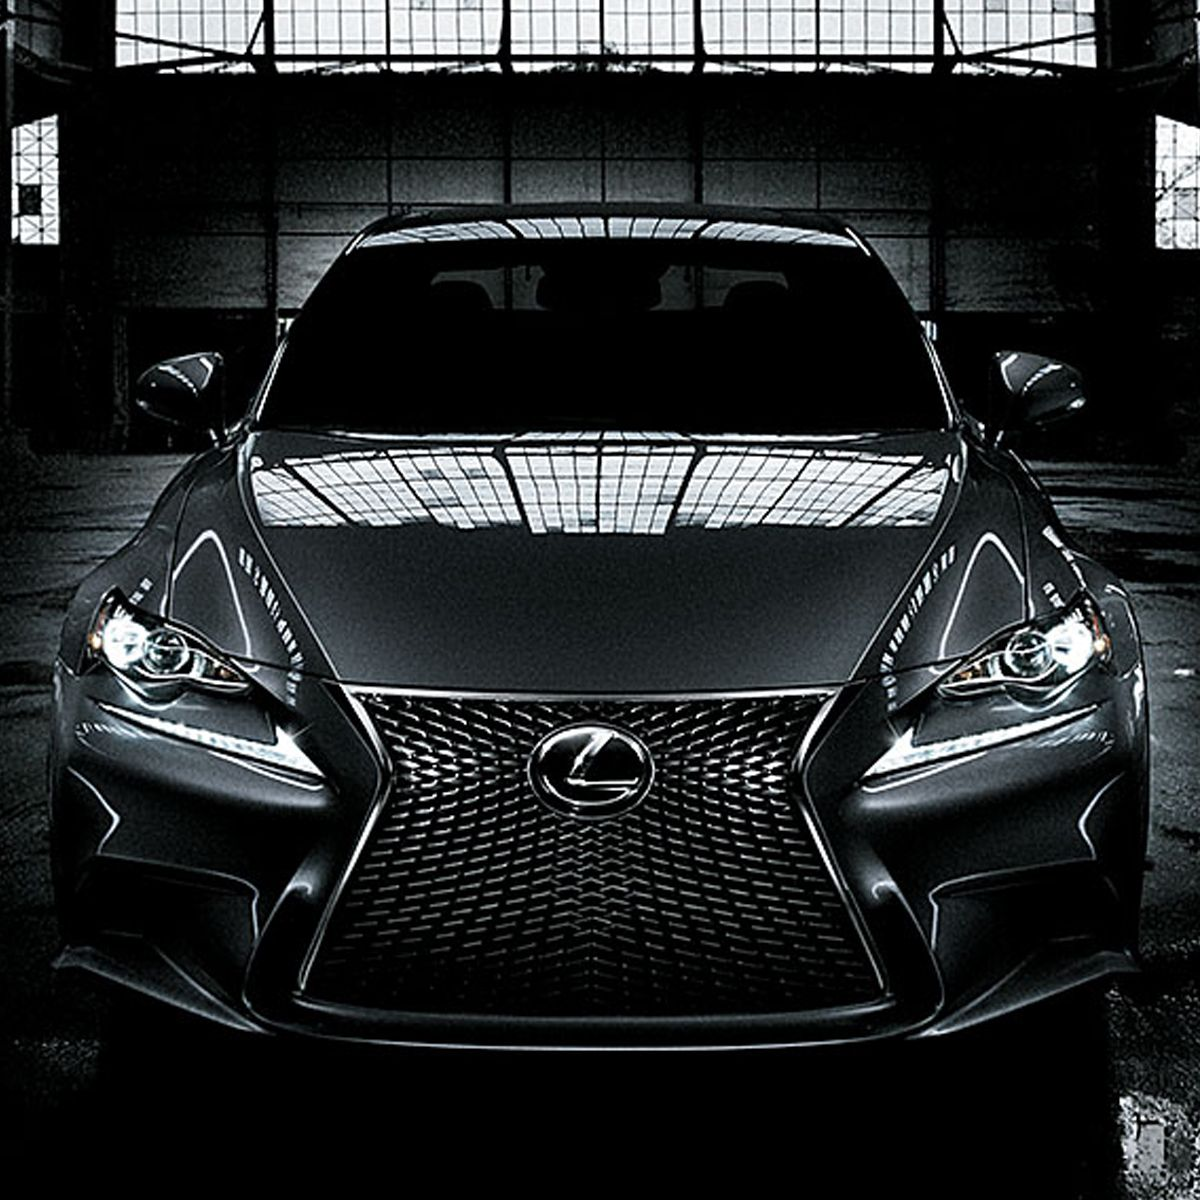 Lexus IS F Sport Lexus cars, Lexus dealership, Lexus